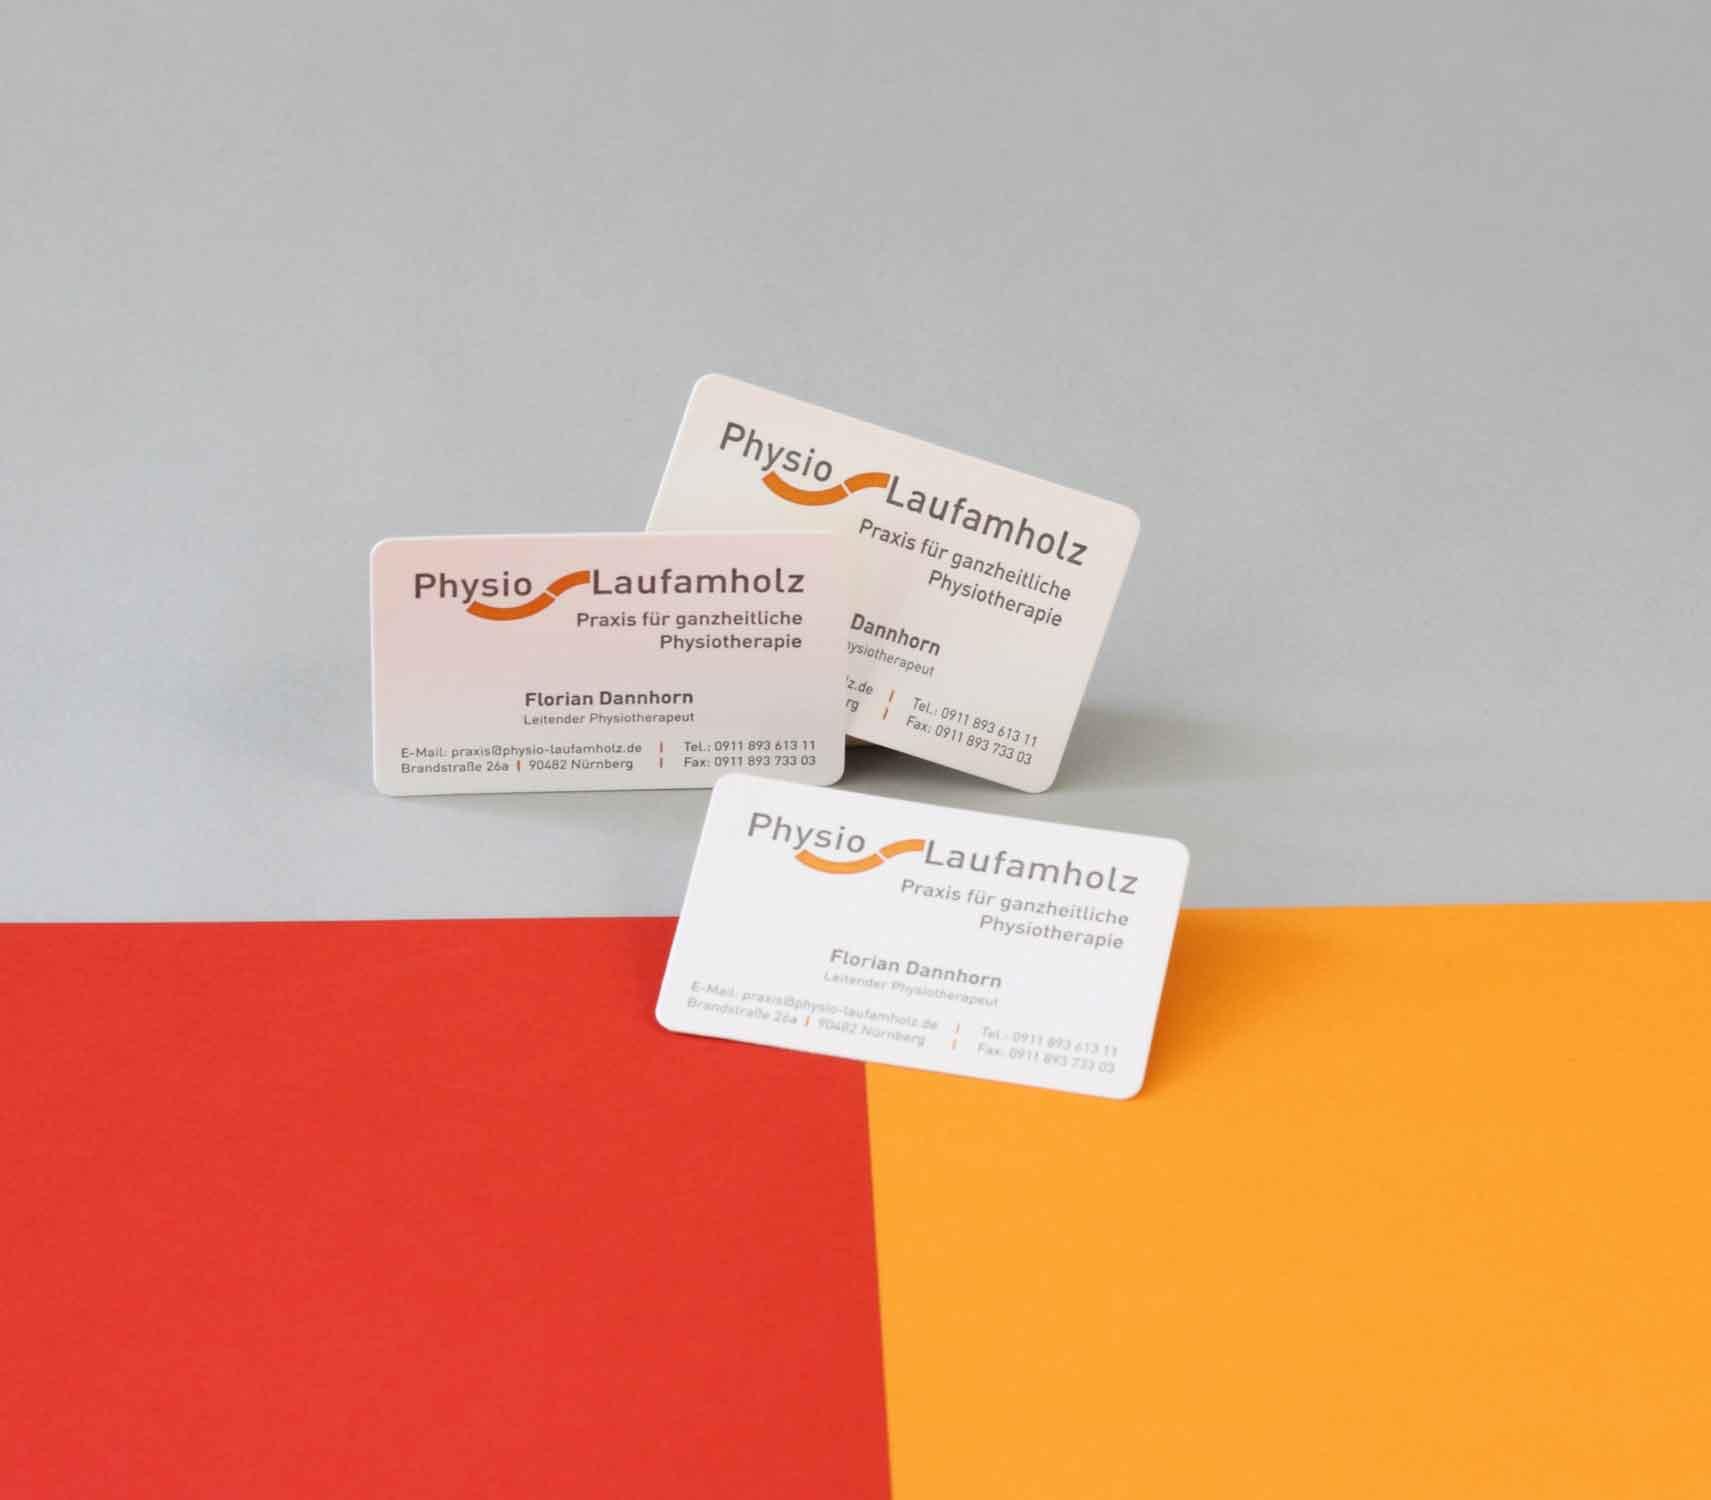 thepert-design-kommunikation-drucksorten-print-visitkarte-corporate-design-logo-pysio-laufamholz